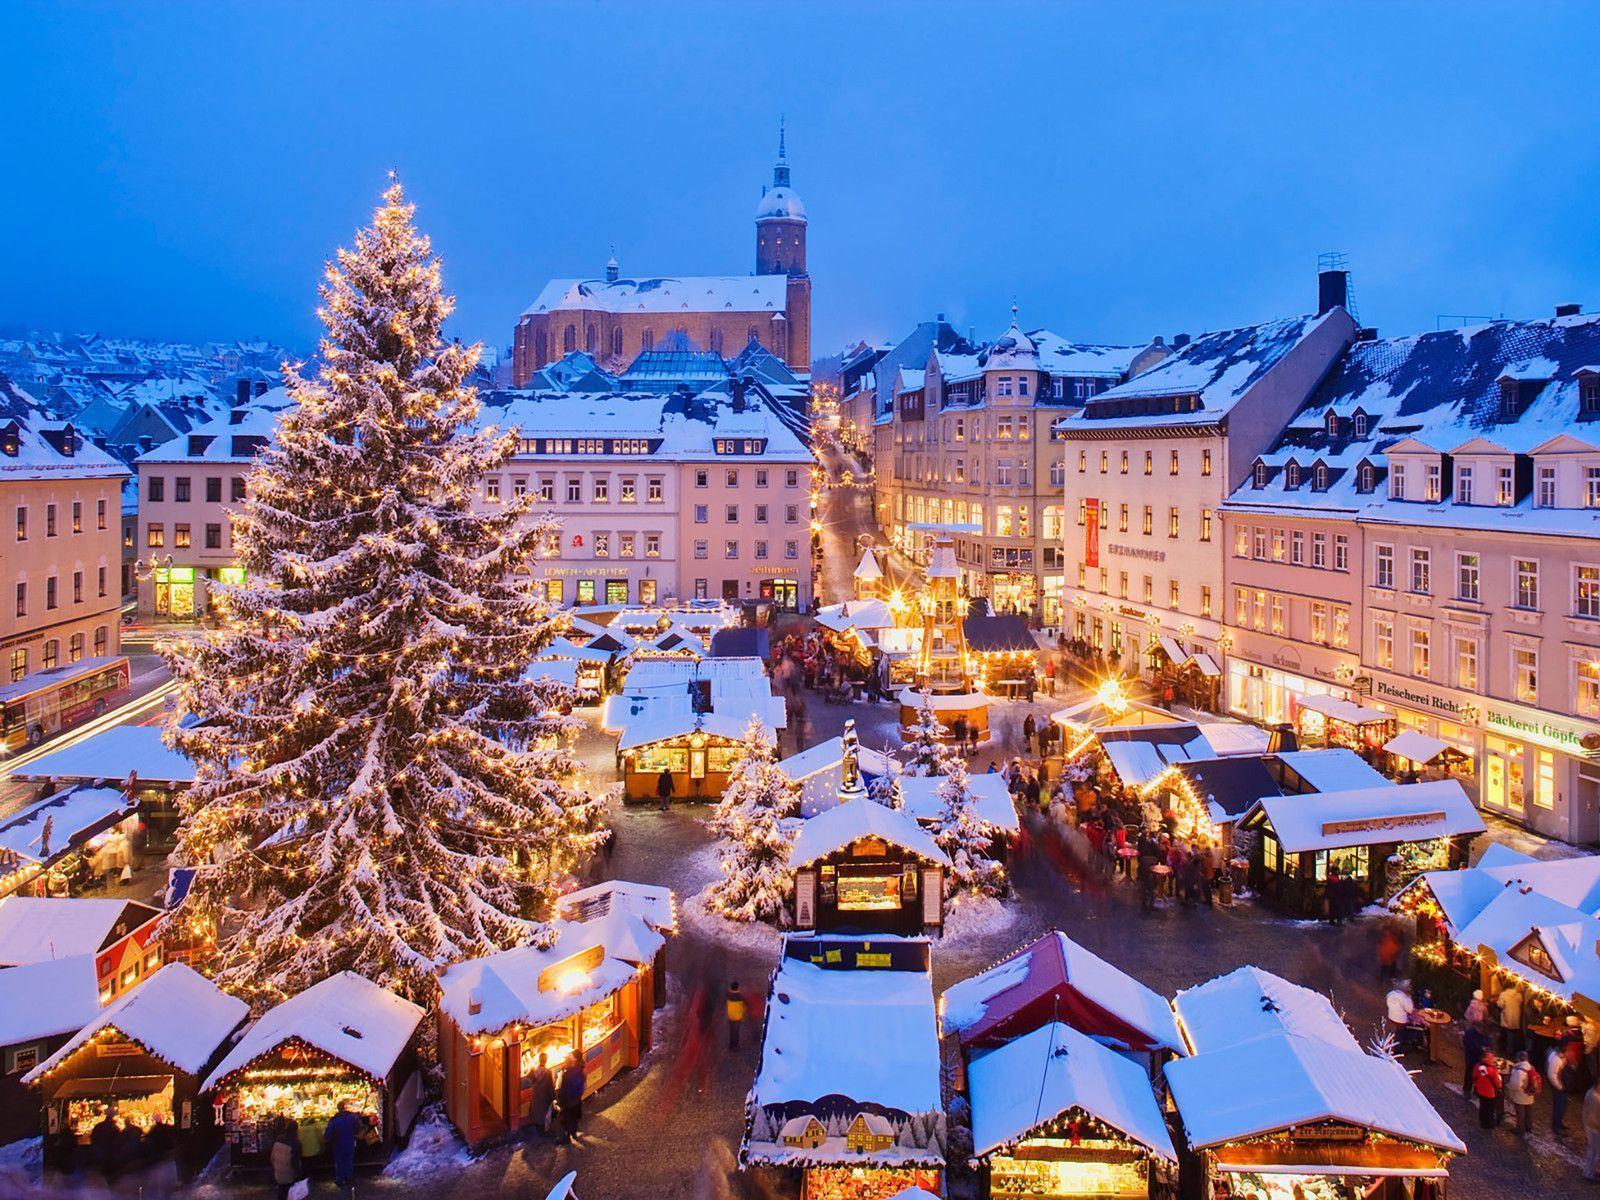 Winter Europe Wallpapers Top Free Winter Europe